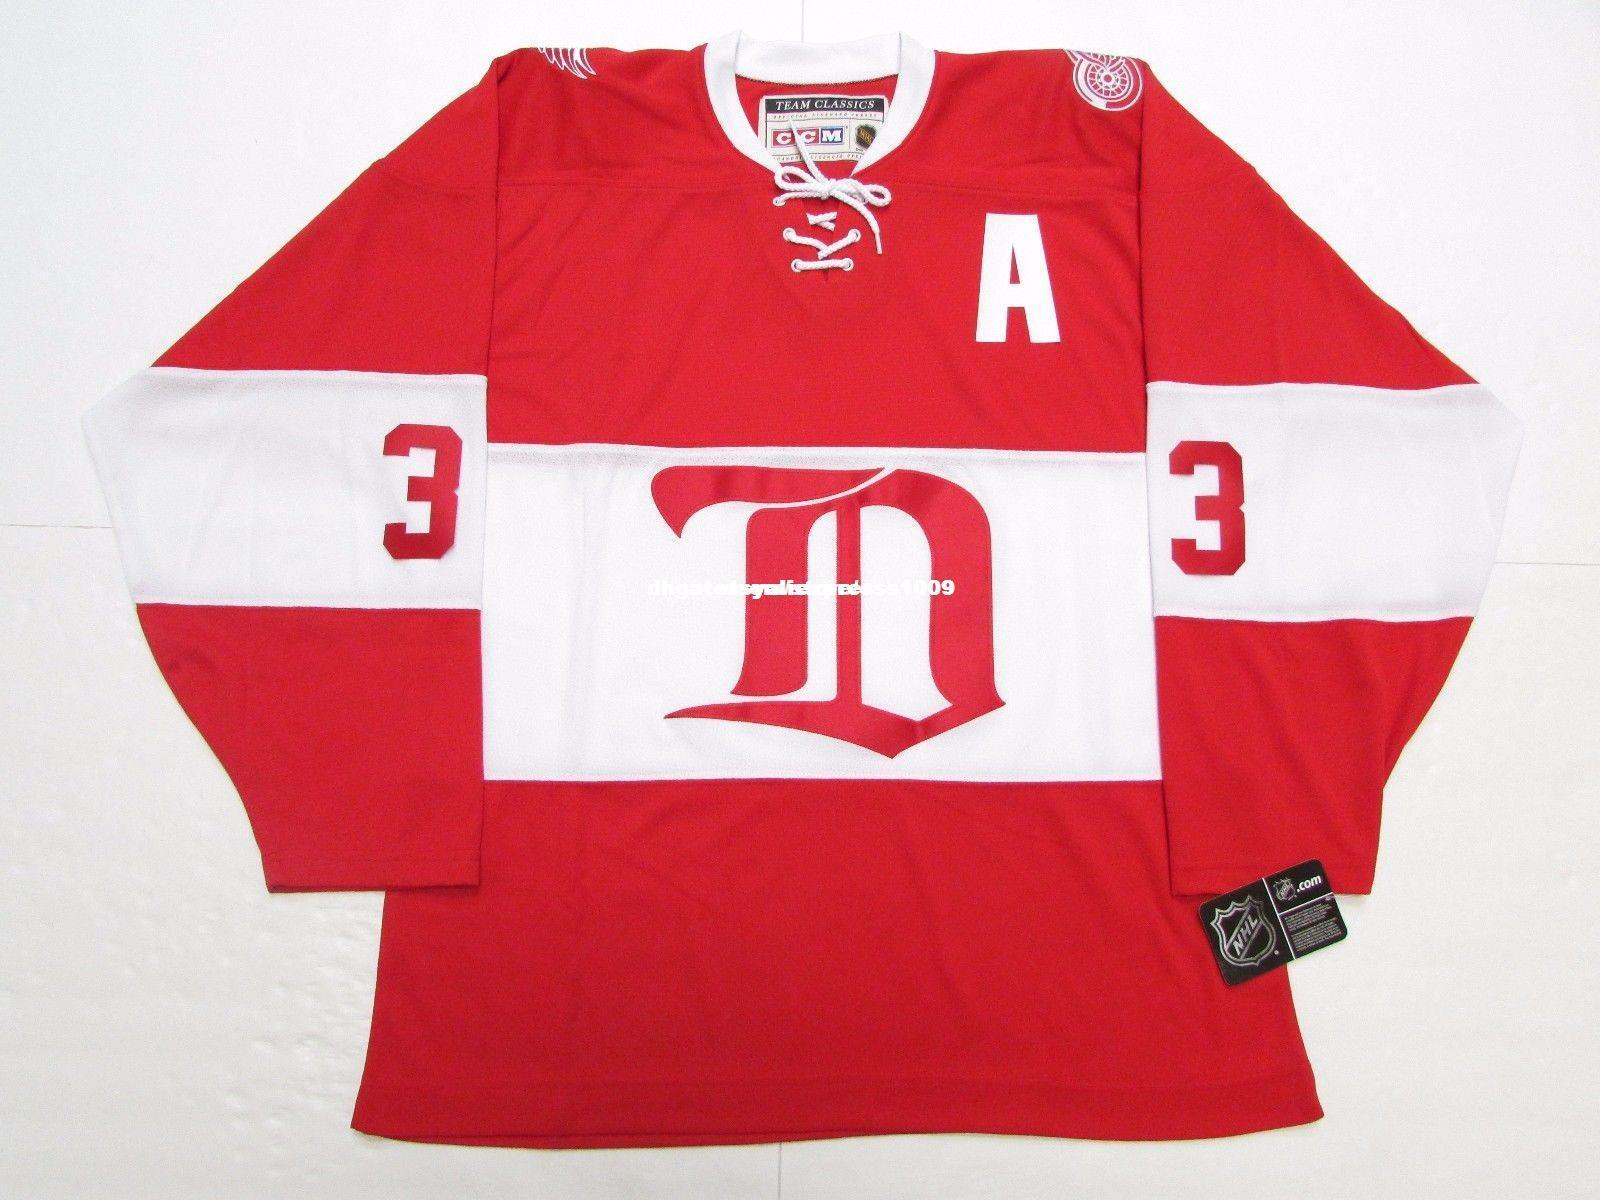 2019 Cheap Custom KRIS DRAPER DETROIT RED WINGS VINTAGE CCM HOCKEY JERSEY  Mens Personalized Stitching Jerseys From Etsyaliexpress e5bd79c4db8